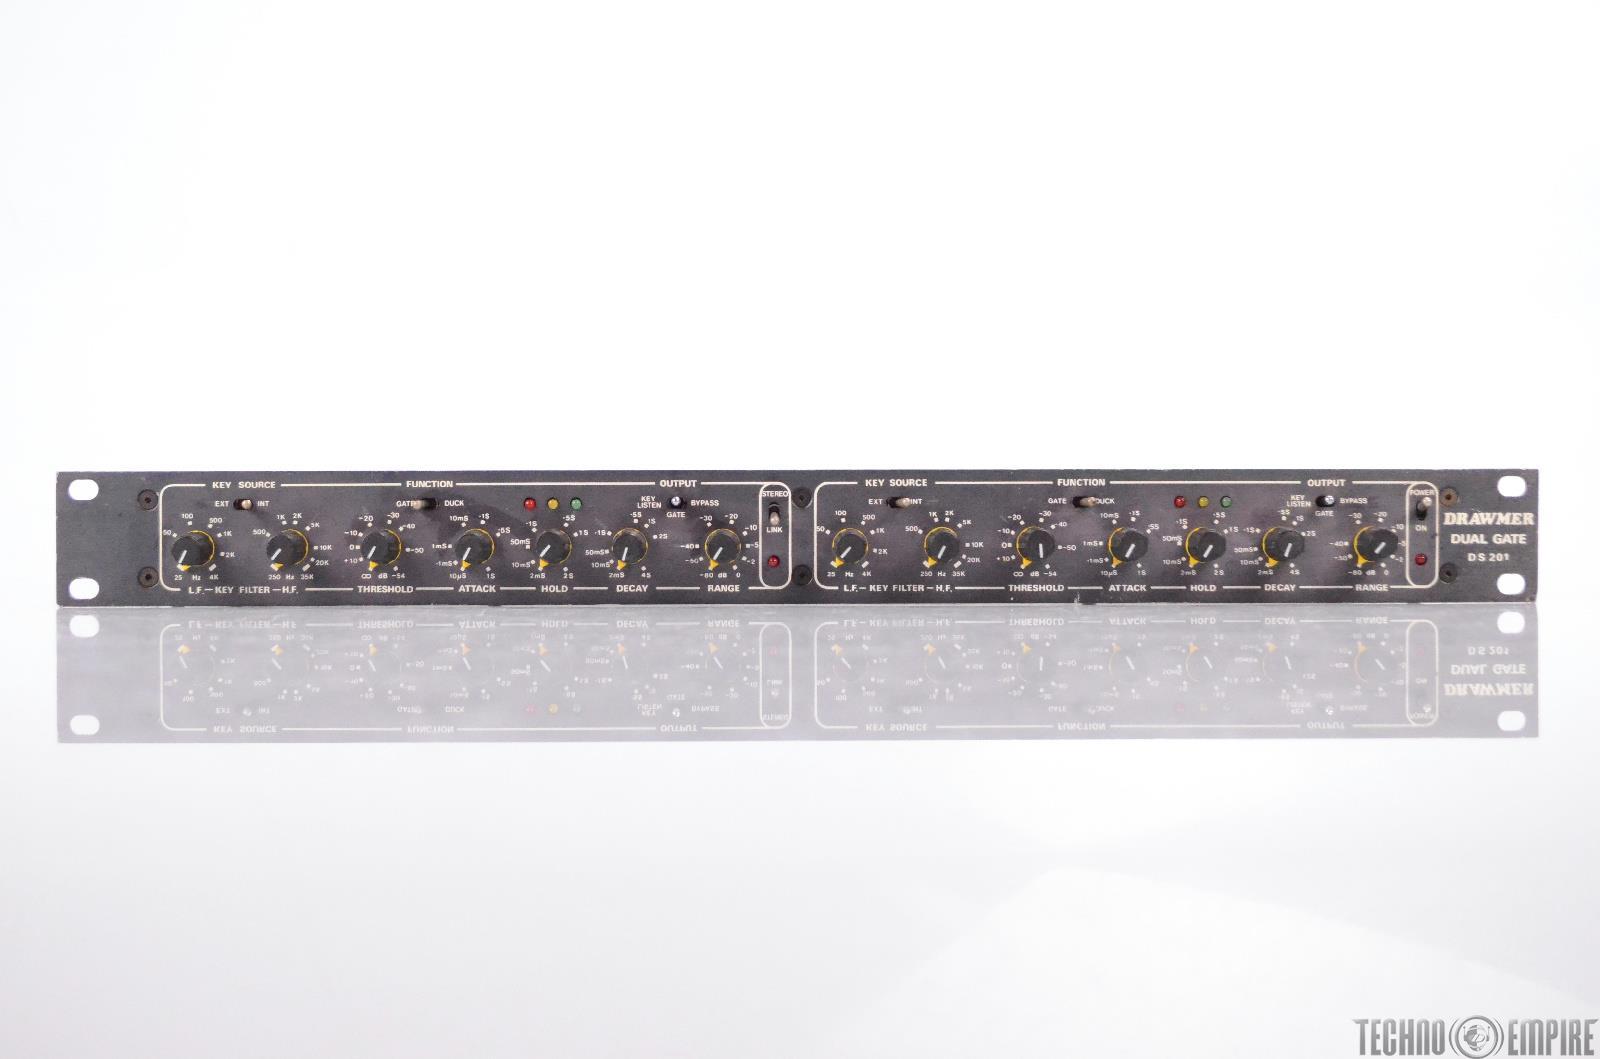 Drawmer DS 201 Stereo Noise Gate & Ducker 2 Channel Dual Rack DS201 XLR #31721